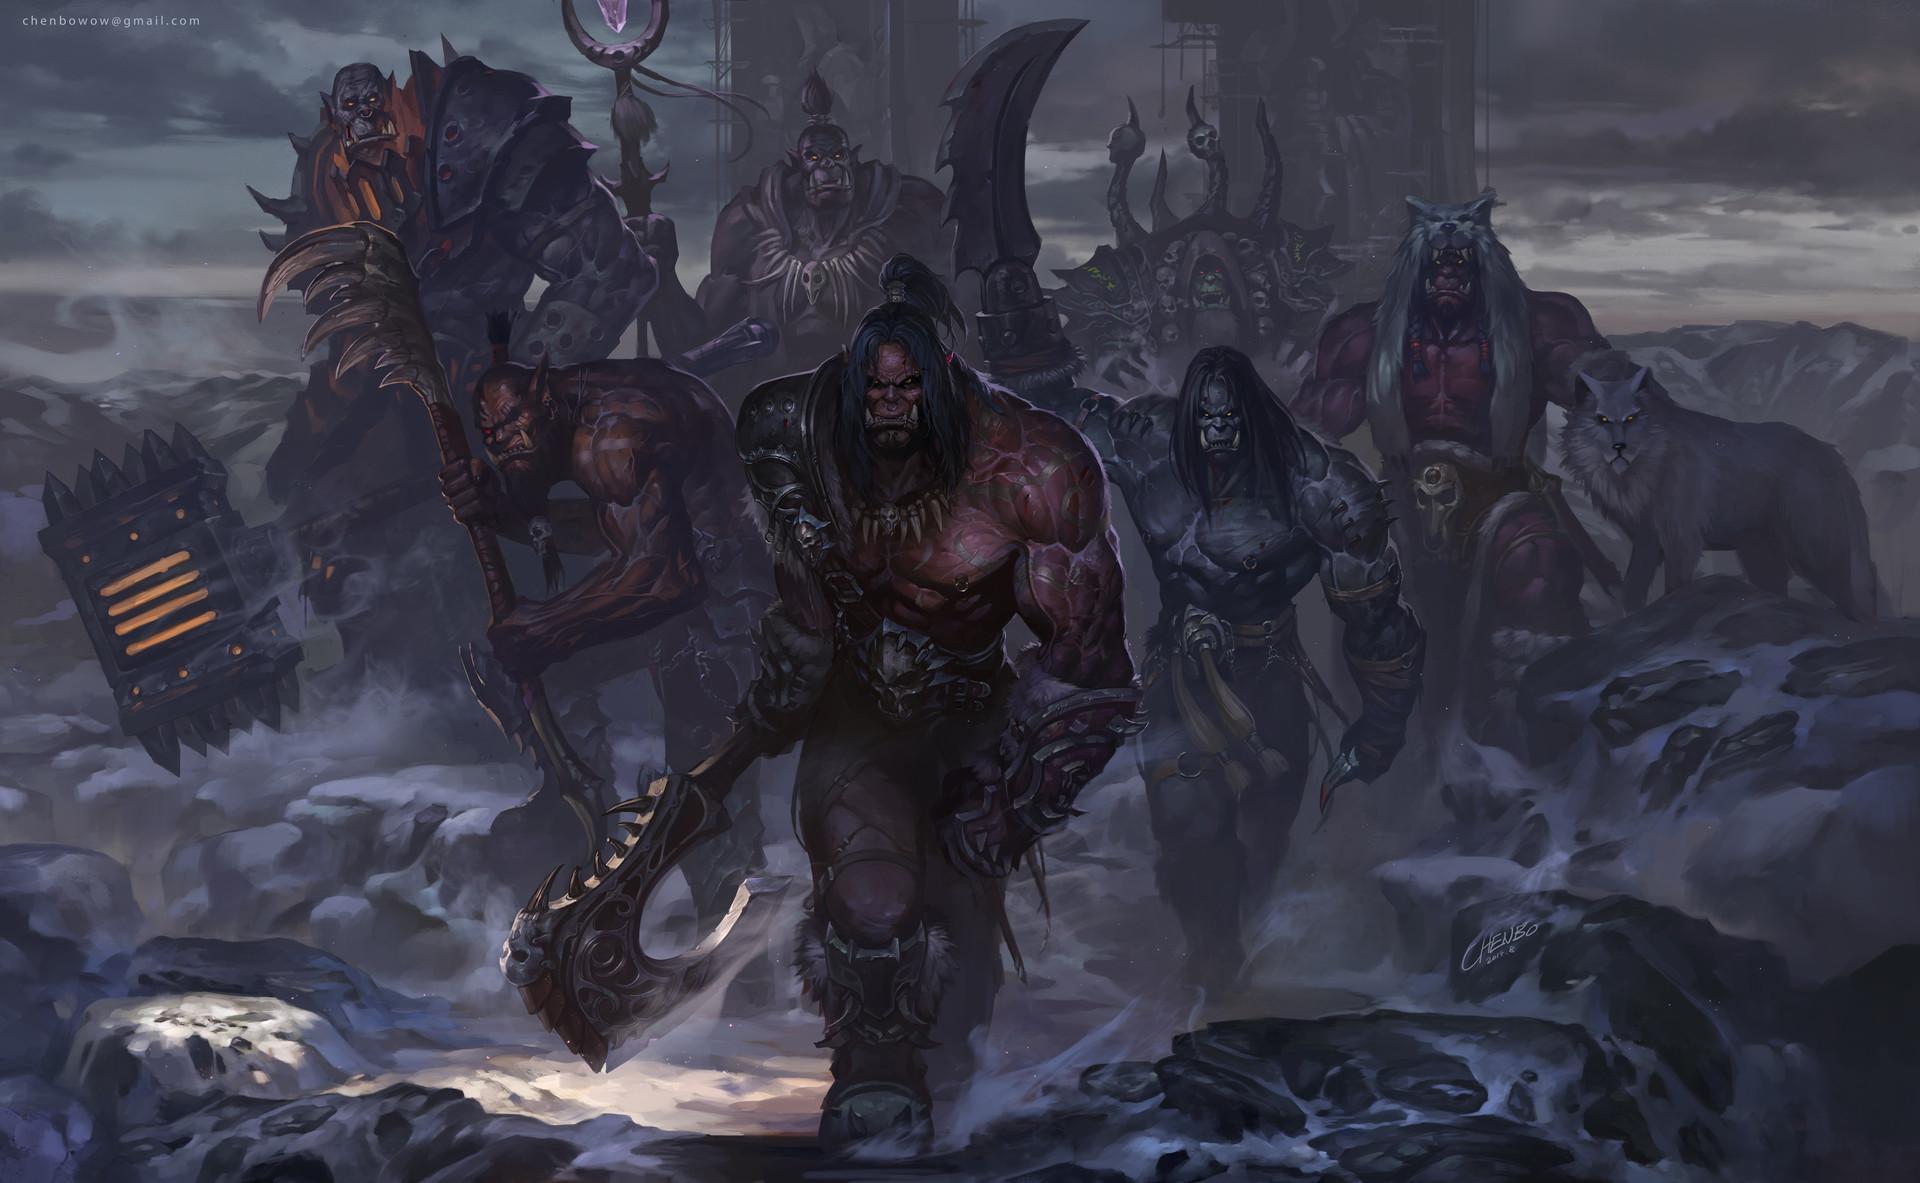 Blackhand World Of Warcraft Grommash Hellscream Gul 039 Dan World Of Warcraft Kargath Bladefist Kilr 1920x1183